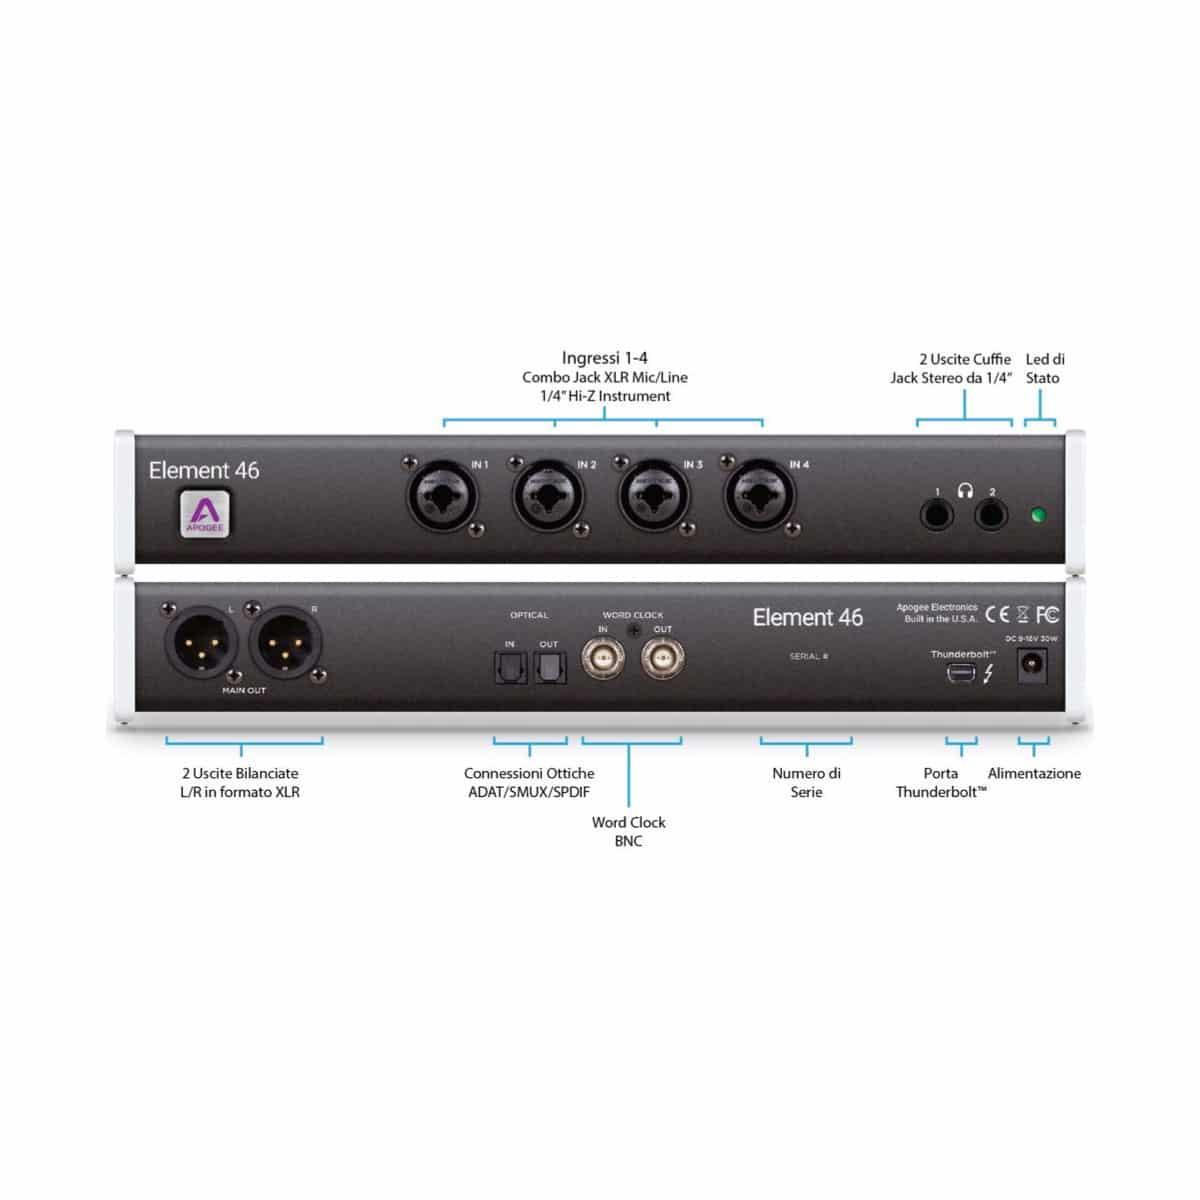 Apogee ELEMENT 46 Pro Audio, Audio Digitale, Schede Audio per PC e MAC Apogee Element 46 041